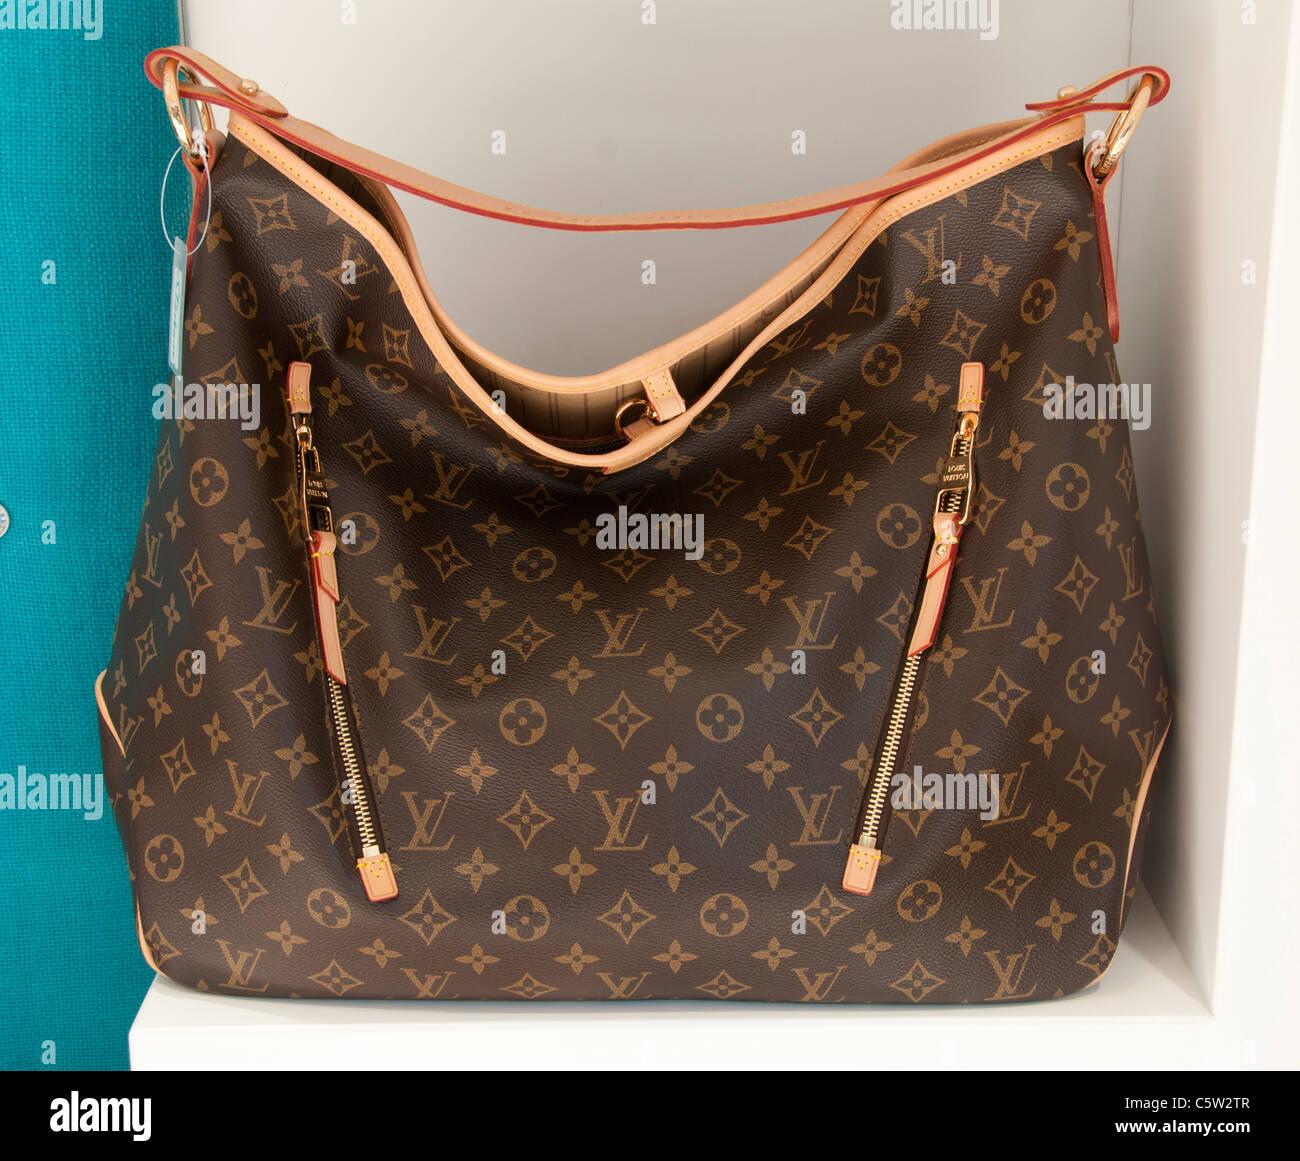 Louis Vuitton Mock Fake Imitation Forgery Sham Bag Bags